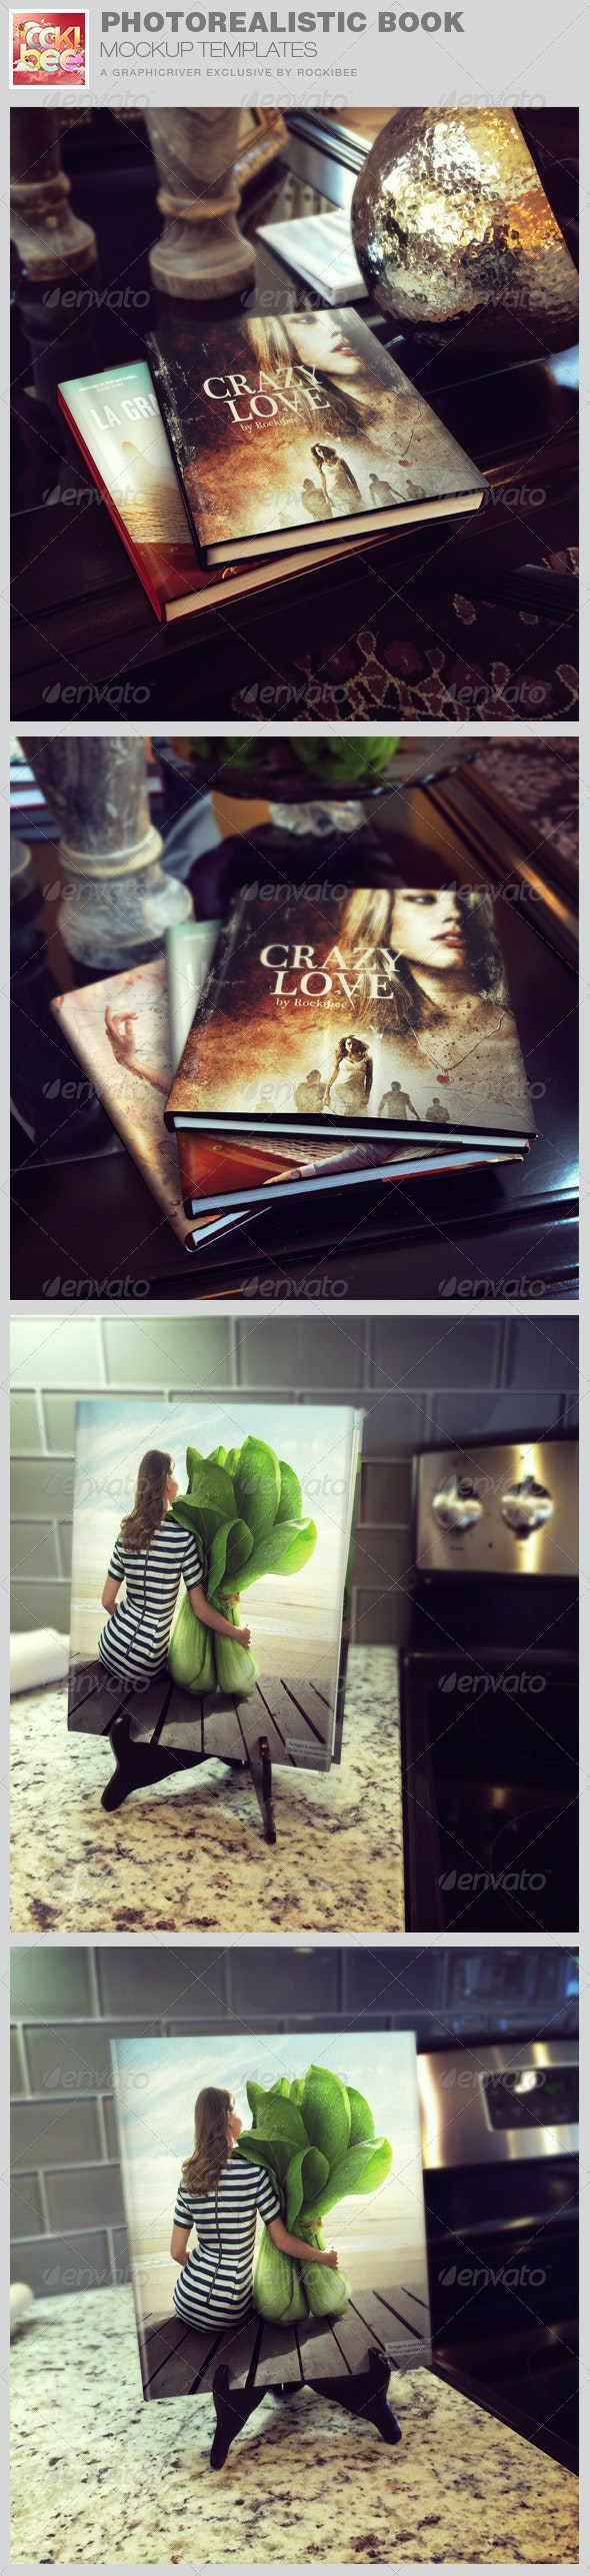 Photorealistic Book Mockup Templates - Books Print